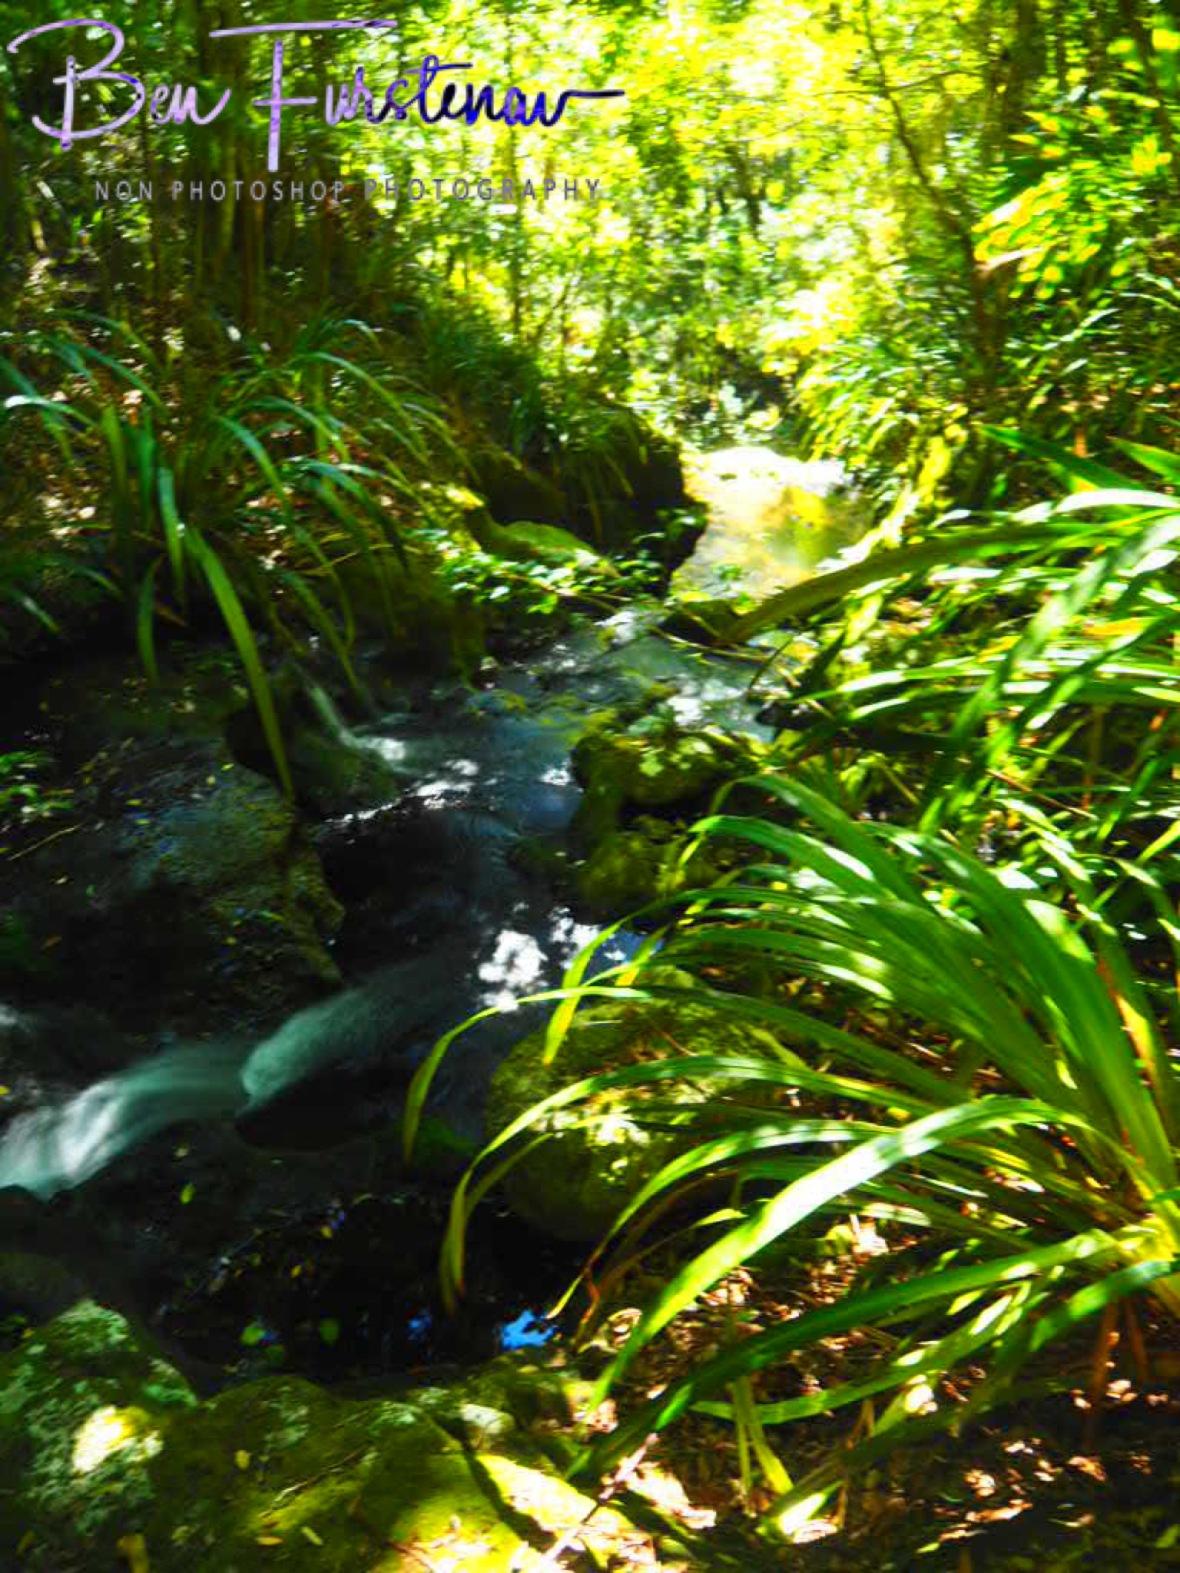 Bright display at Lamington National Park, Queensland, Australia